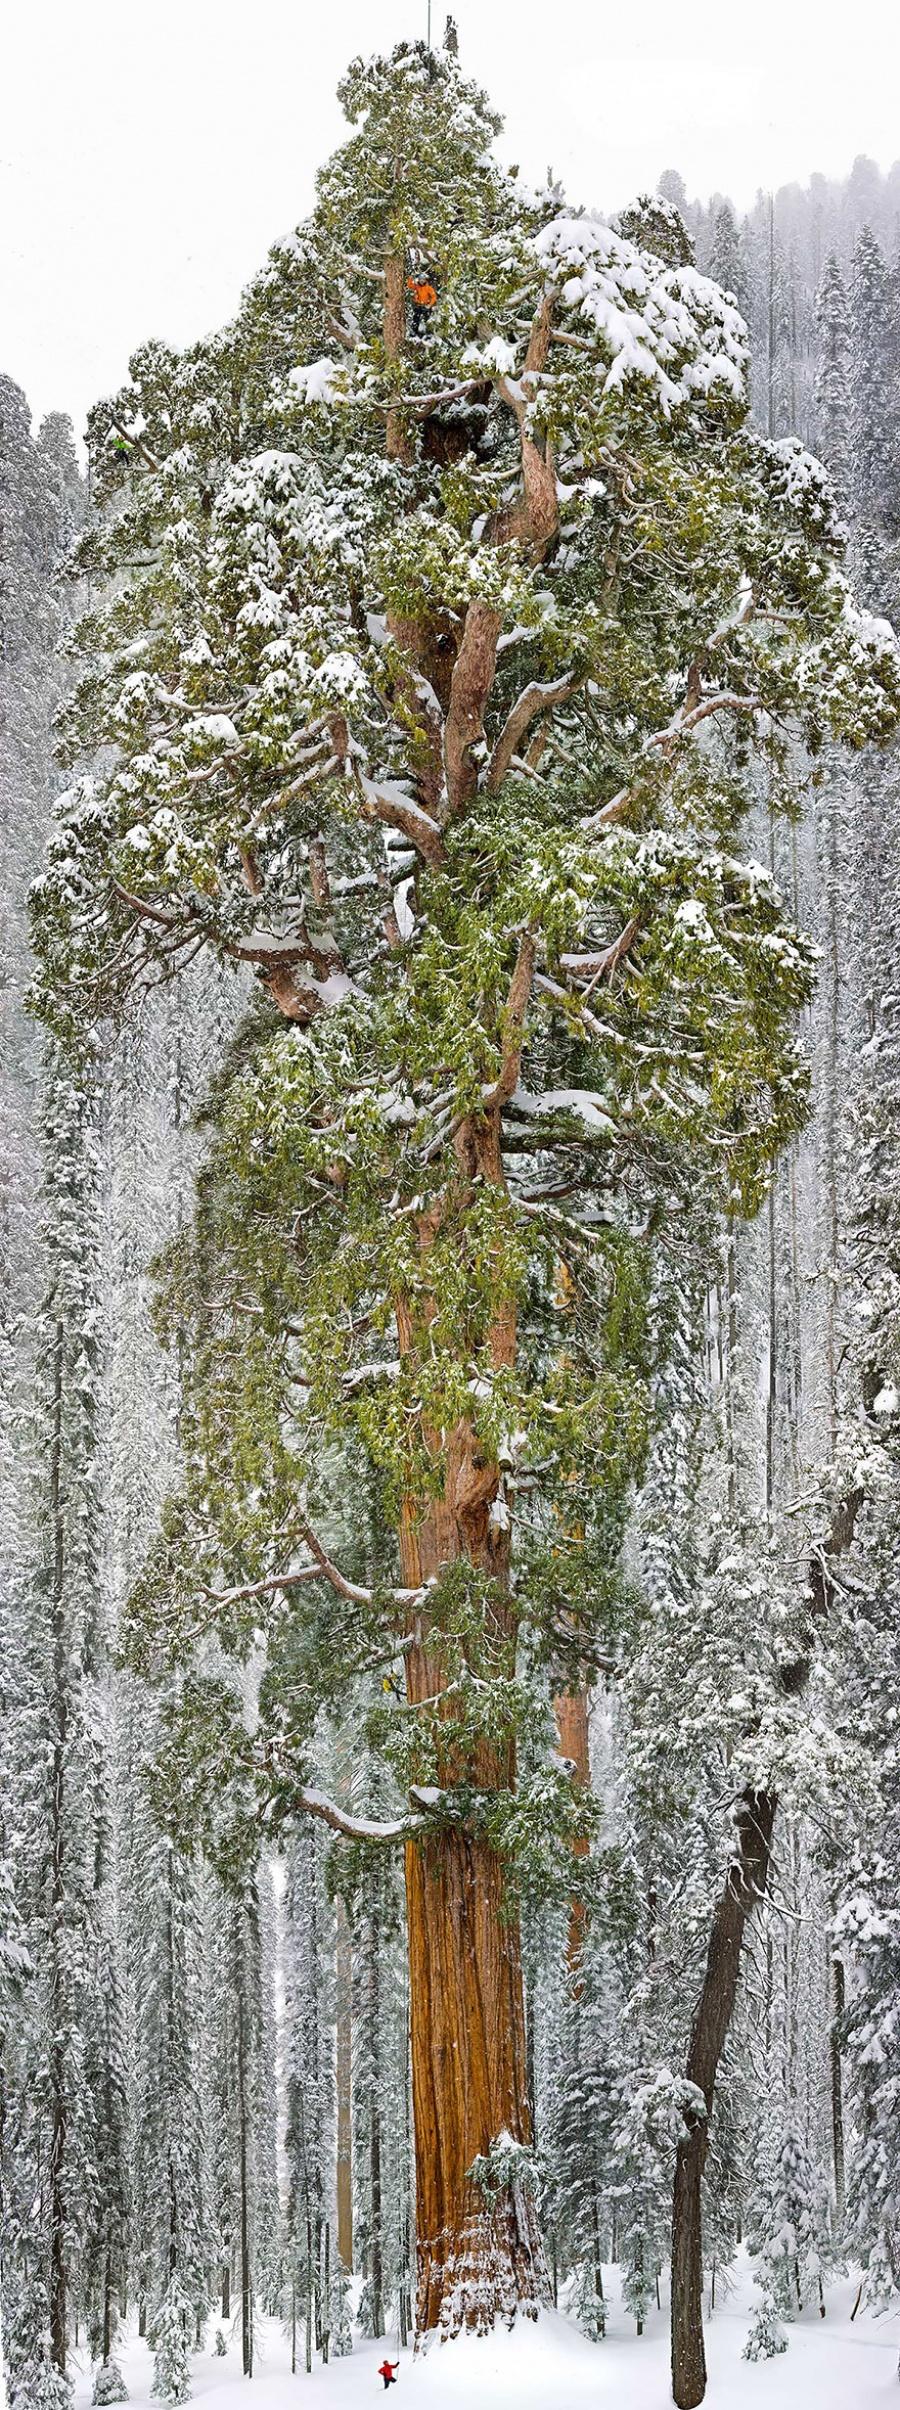 7631910-R3L8T8D-900-small-man-grand-nature-landscape-photography-24